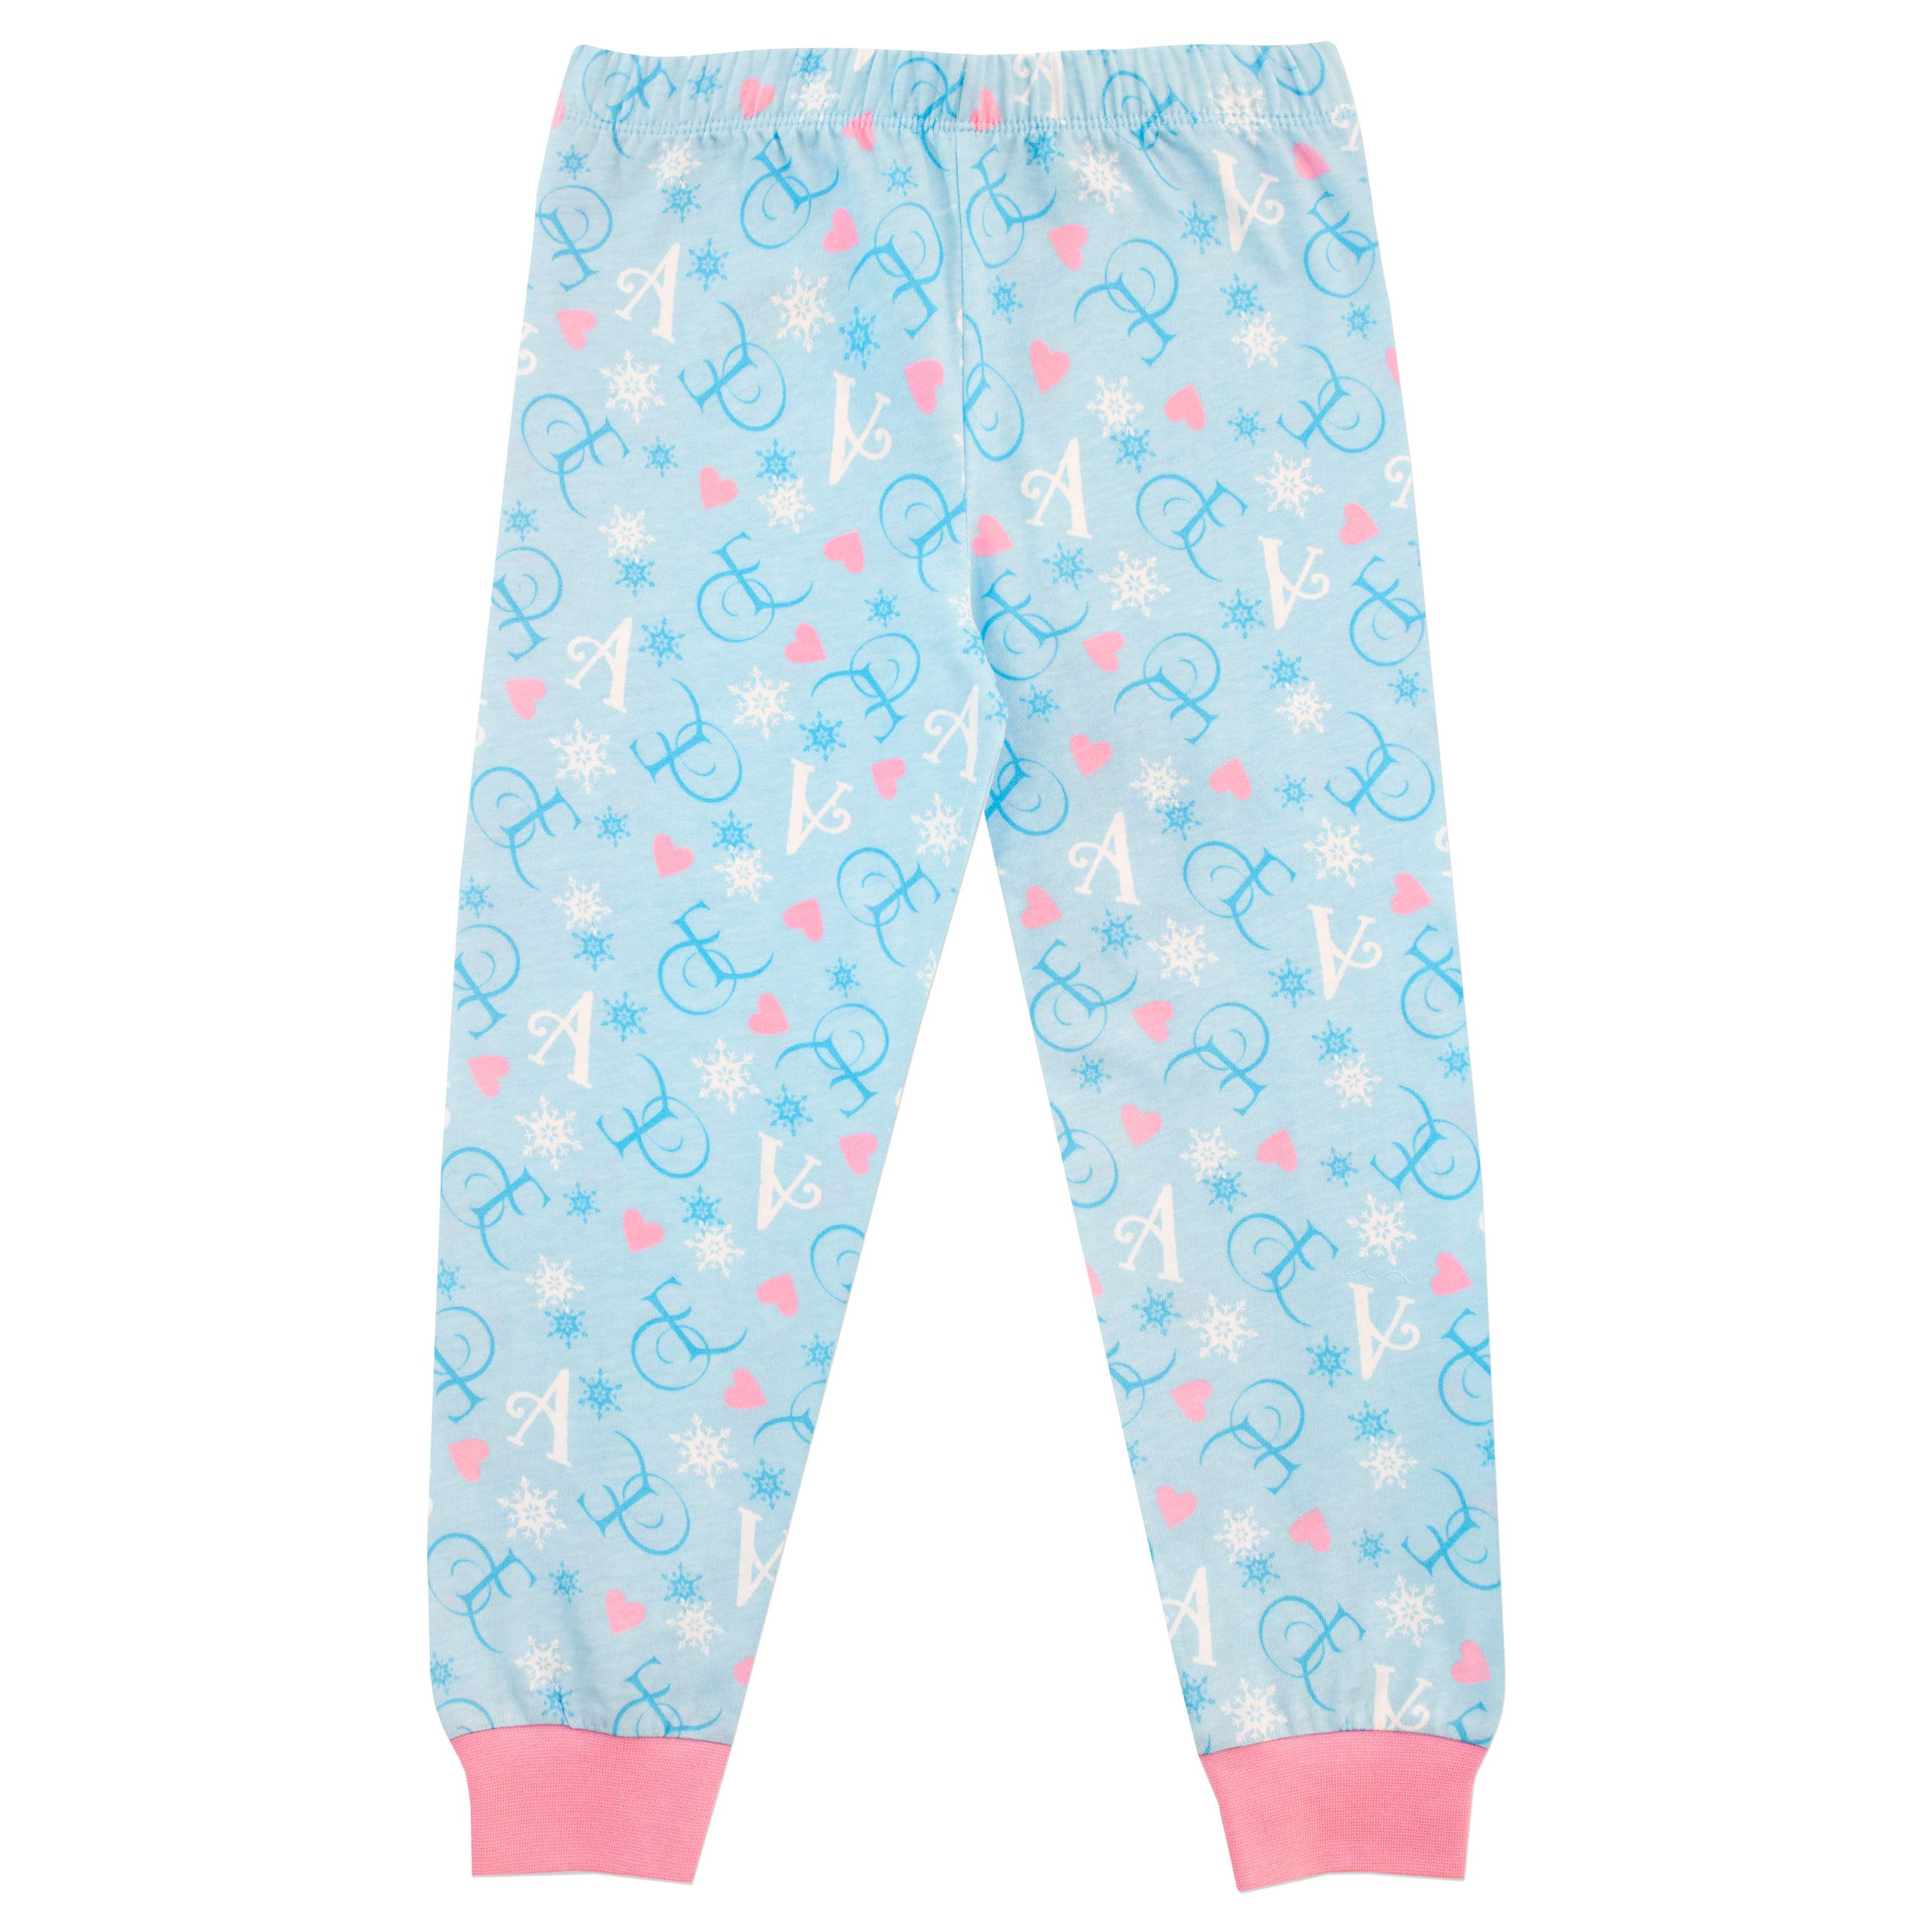 c46414d5d3 Disney - Pijama para niñas - La Reina del Hielo - Frozen - De Disney